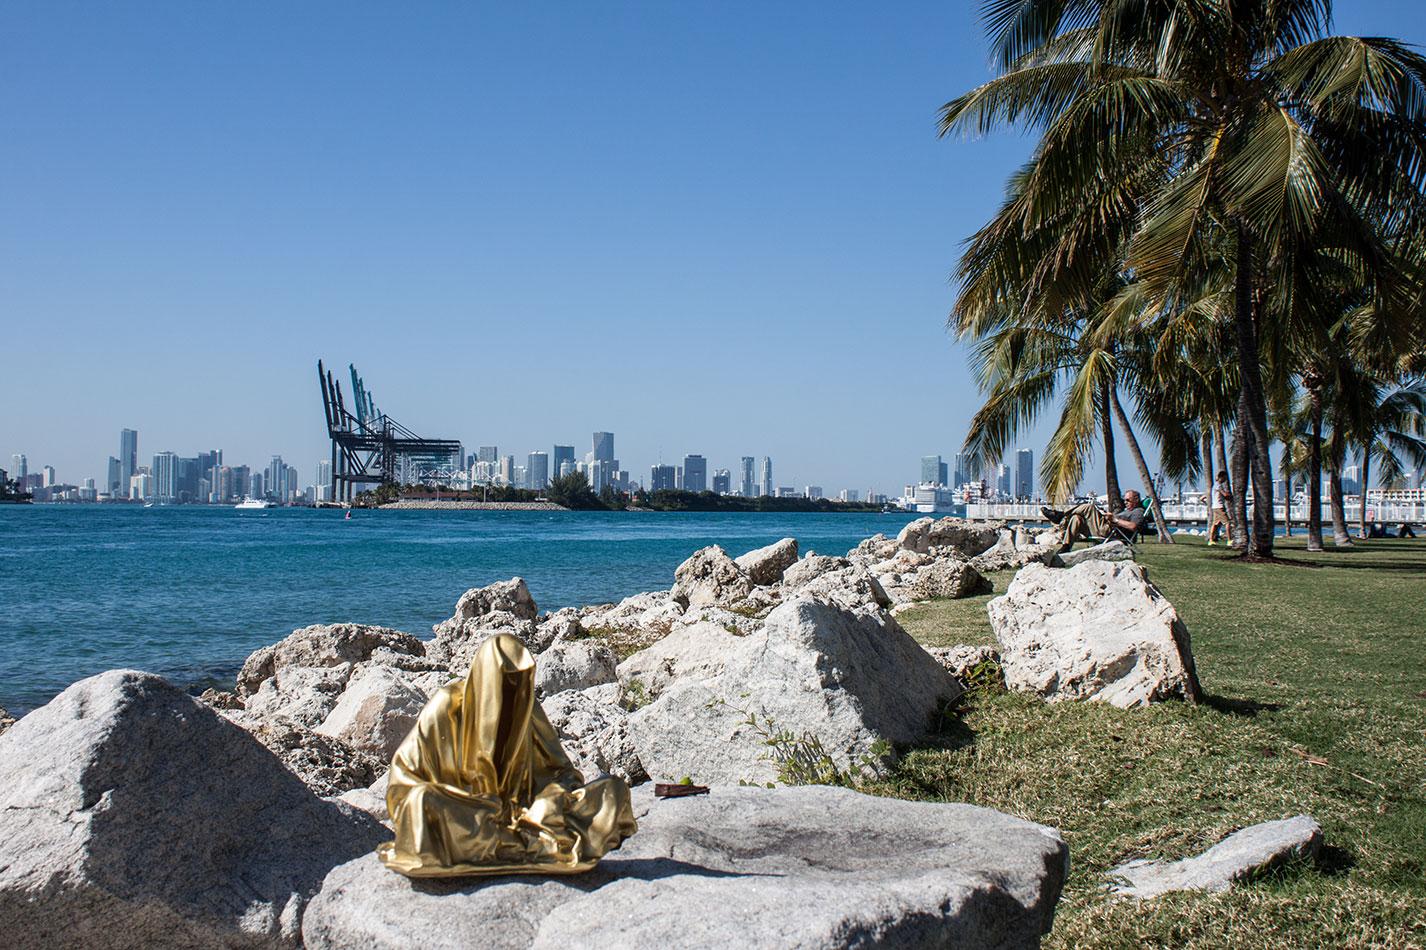 public-art-basel-miami-beach-fair-usa-florida-guardians-of-time-manfred-kili-kielnhofer-contemporary-fine-art-modern-arts-design-antiques-sculpture-6829